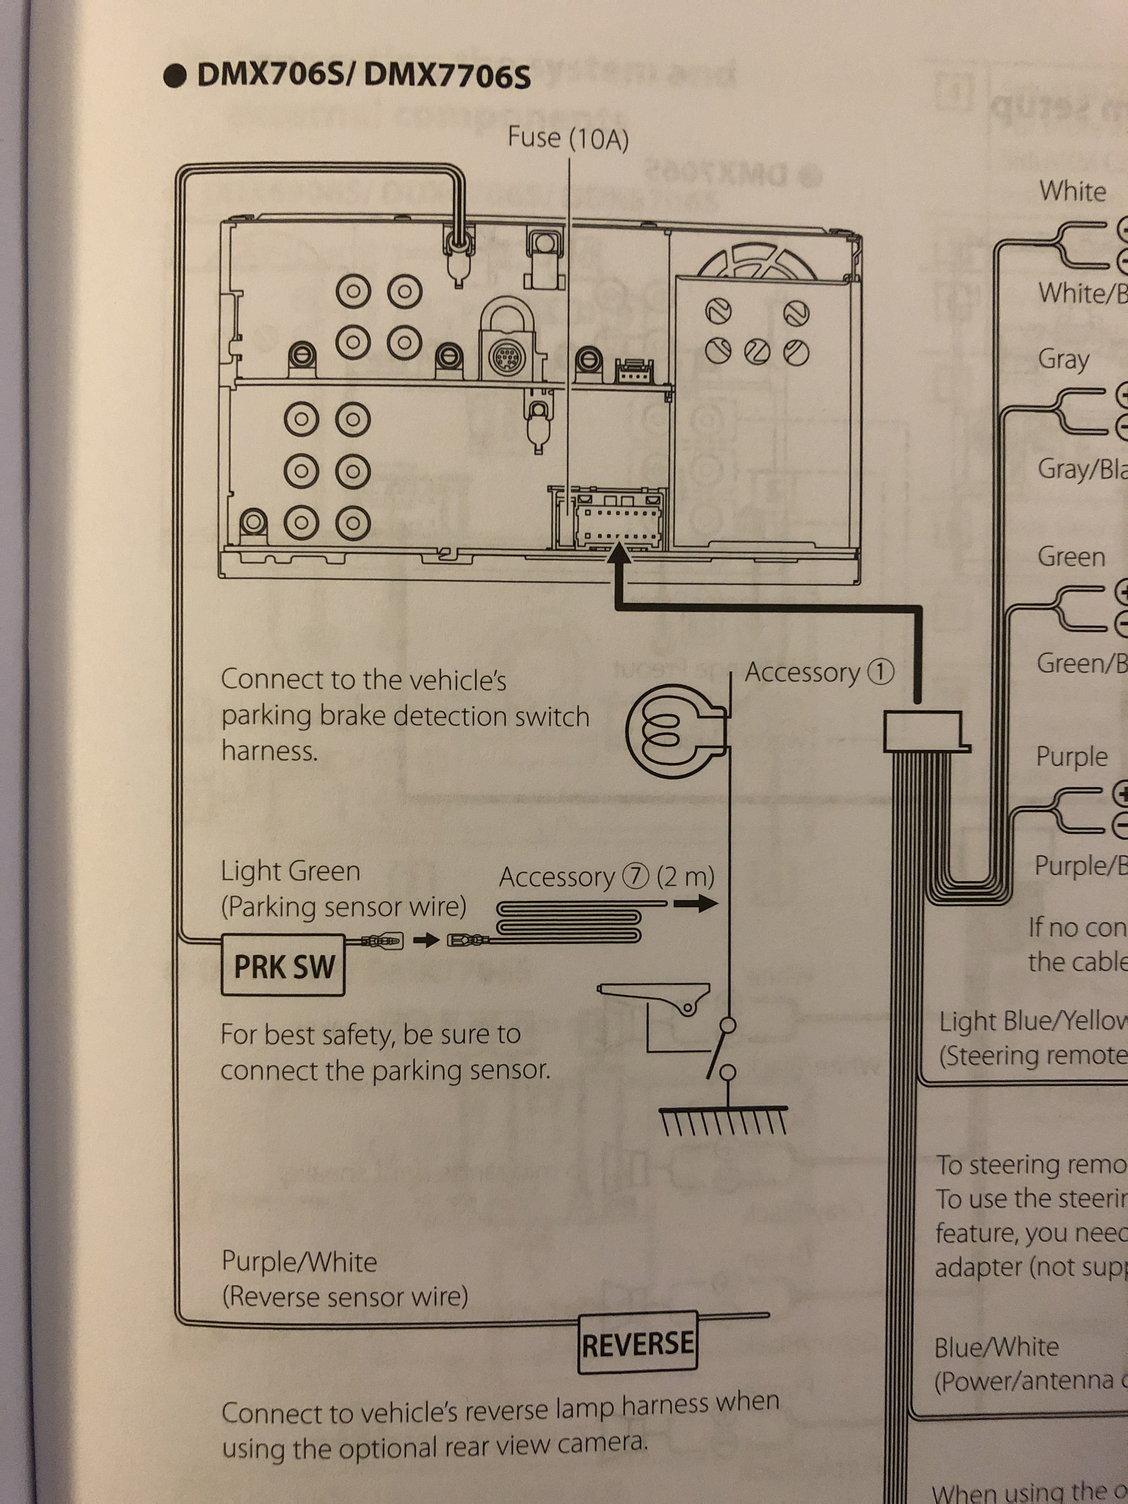 Back Up Camera Wiring - CorvetteForum - Chevrolet Corvette ... Kenwood Reverse Camera Wiring Diagram on dual stereo wiring harness diagram, electrical light switch wiring diagram, xenon wiring diagram, reversing solenoid wiring diagram, center console wiring diagram, dvd wiring diagram, driving lights wiring diagram, tv wiring diagram, abs brakes wiring diagram, cruise control wiring diagram, radio wiring diagram, a/c wiring diagram, cd player wiring diagram, alarm wiring diagram, dc reversing relay wiring diagram, push button start wiring diagram, reverse polarity relay diagram, relay schematic wiring diagram, heated seat wiring diagram, auto wiring diagram,